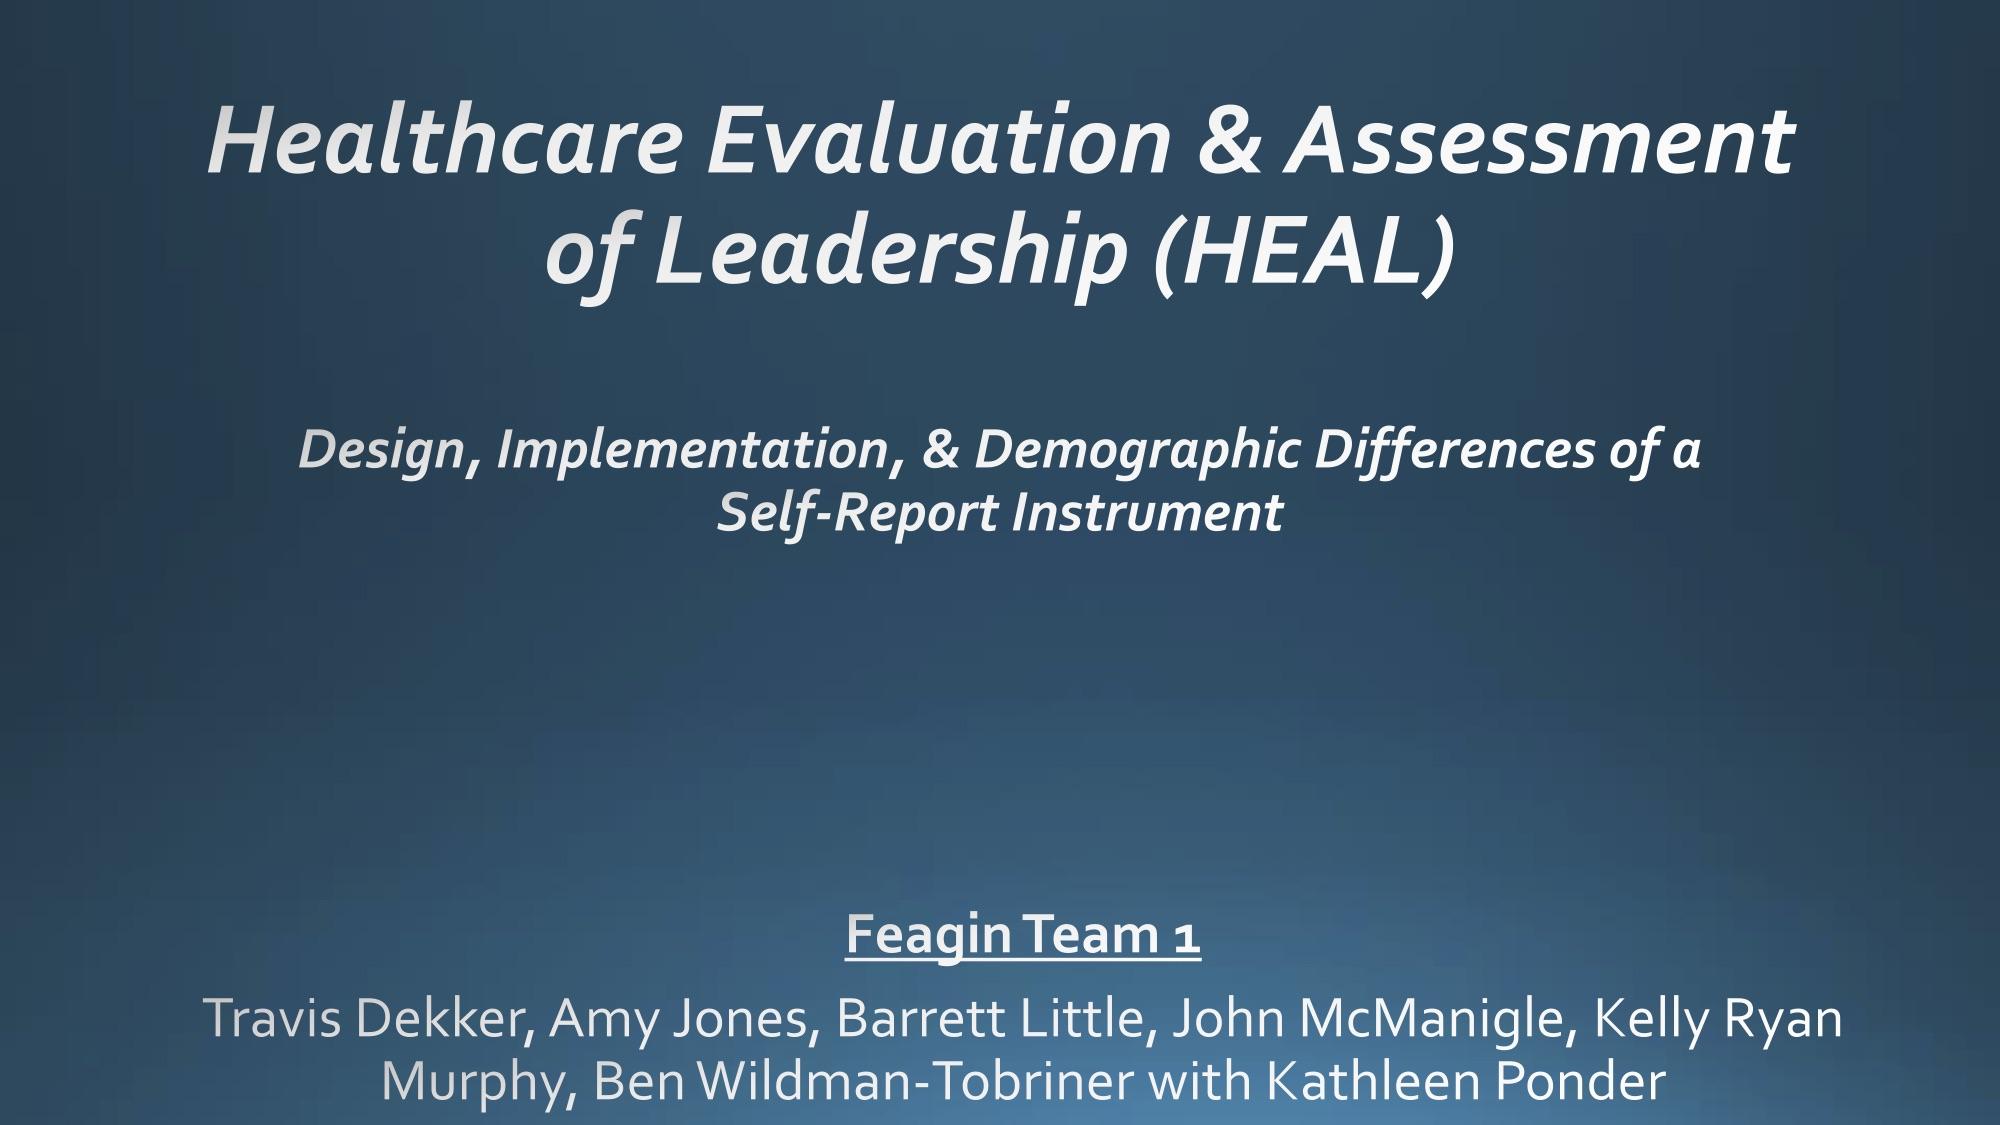 Healthcare Evaluation  Assessment of Leadership (HEAL).pdf - Team 1.jpg